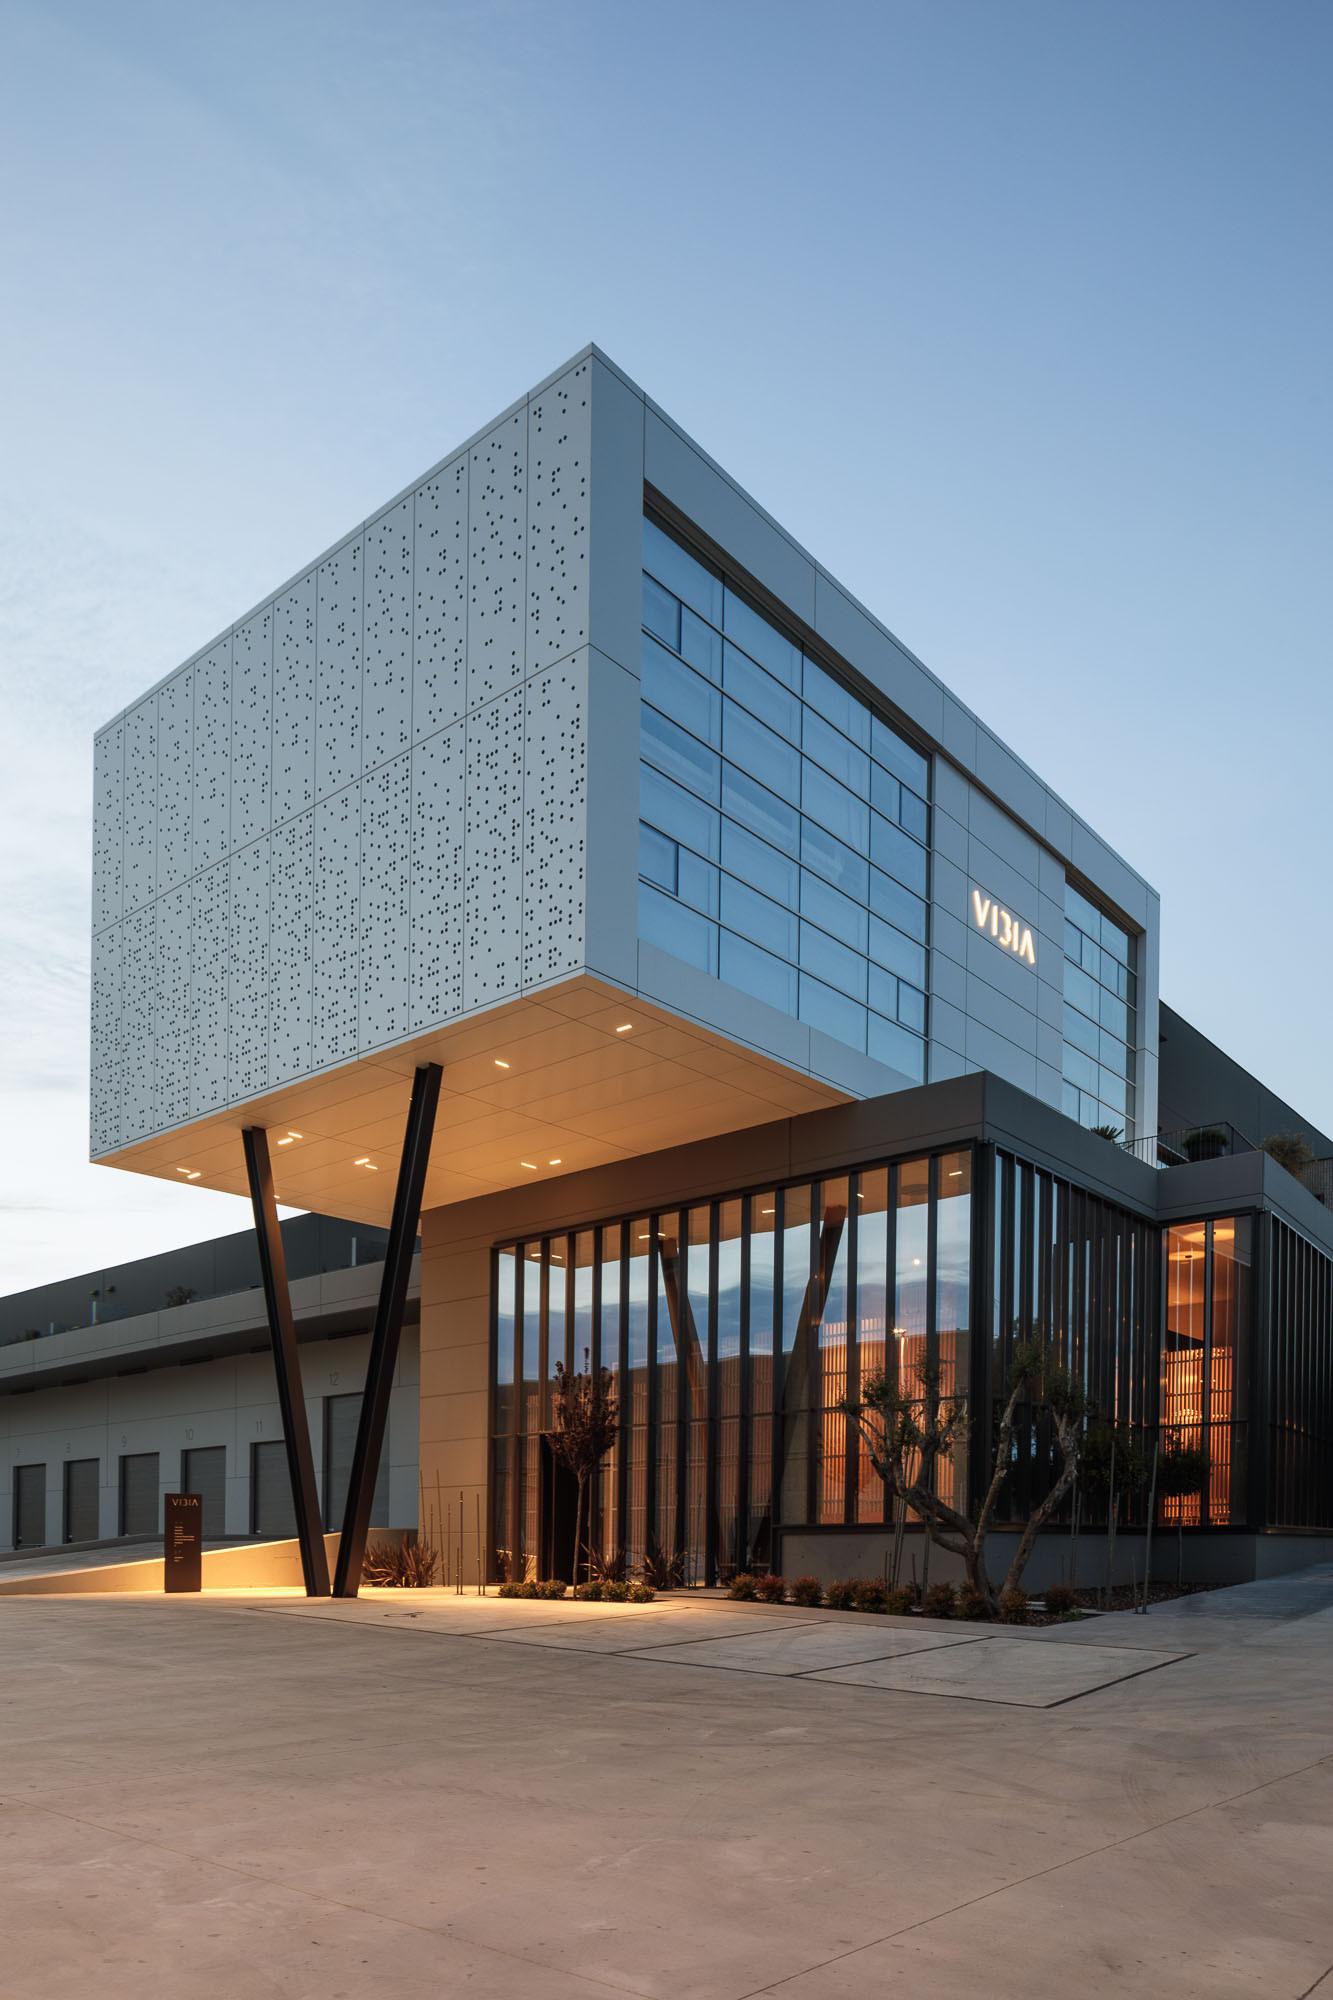 sausriballonch.arquitectes.vibia (1).jpg